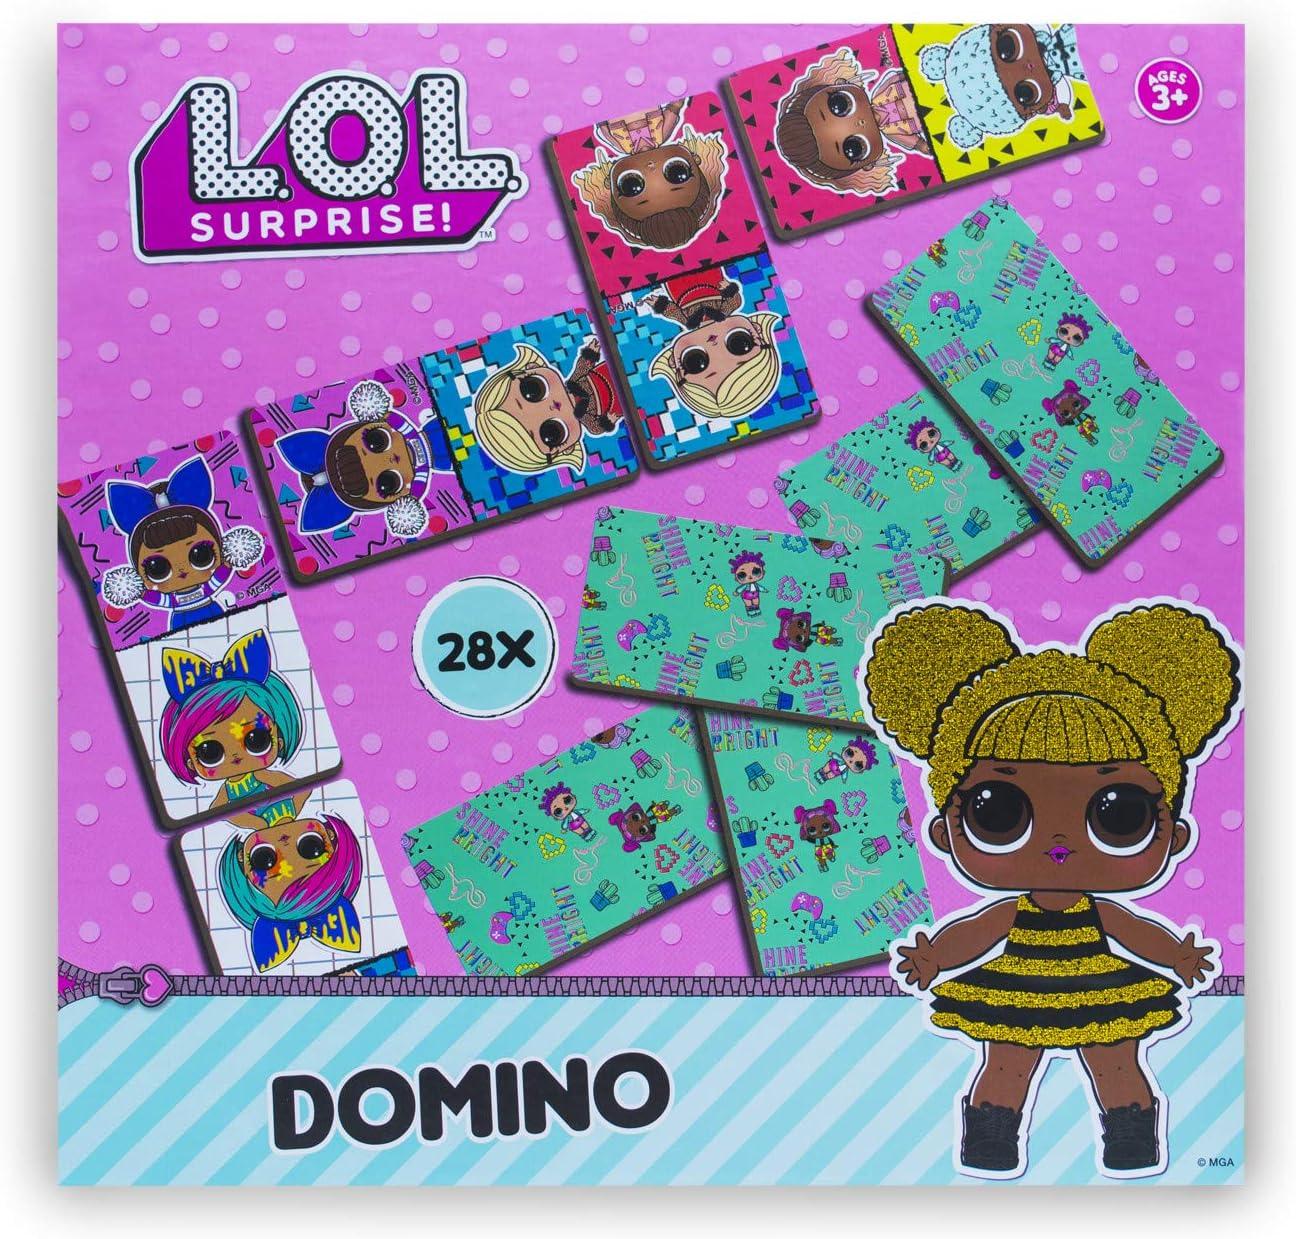 Lol Surprise Domino